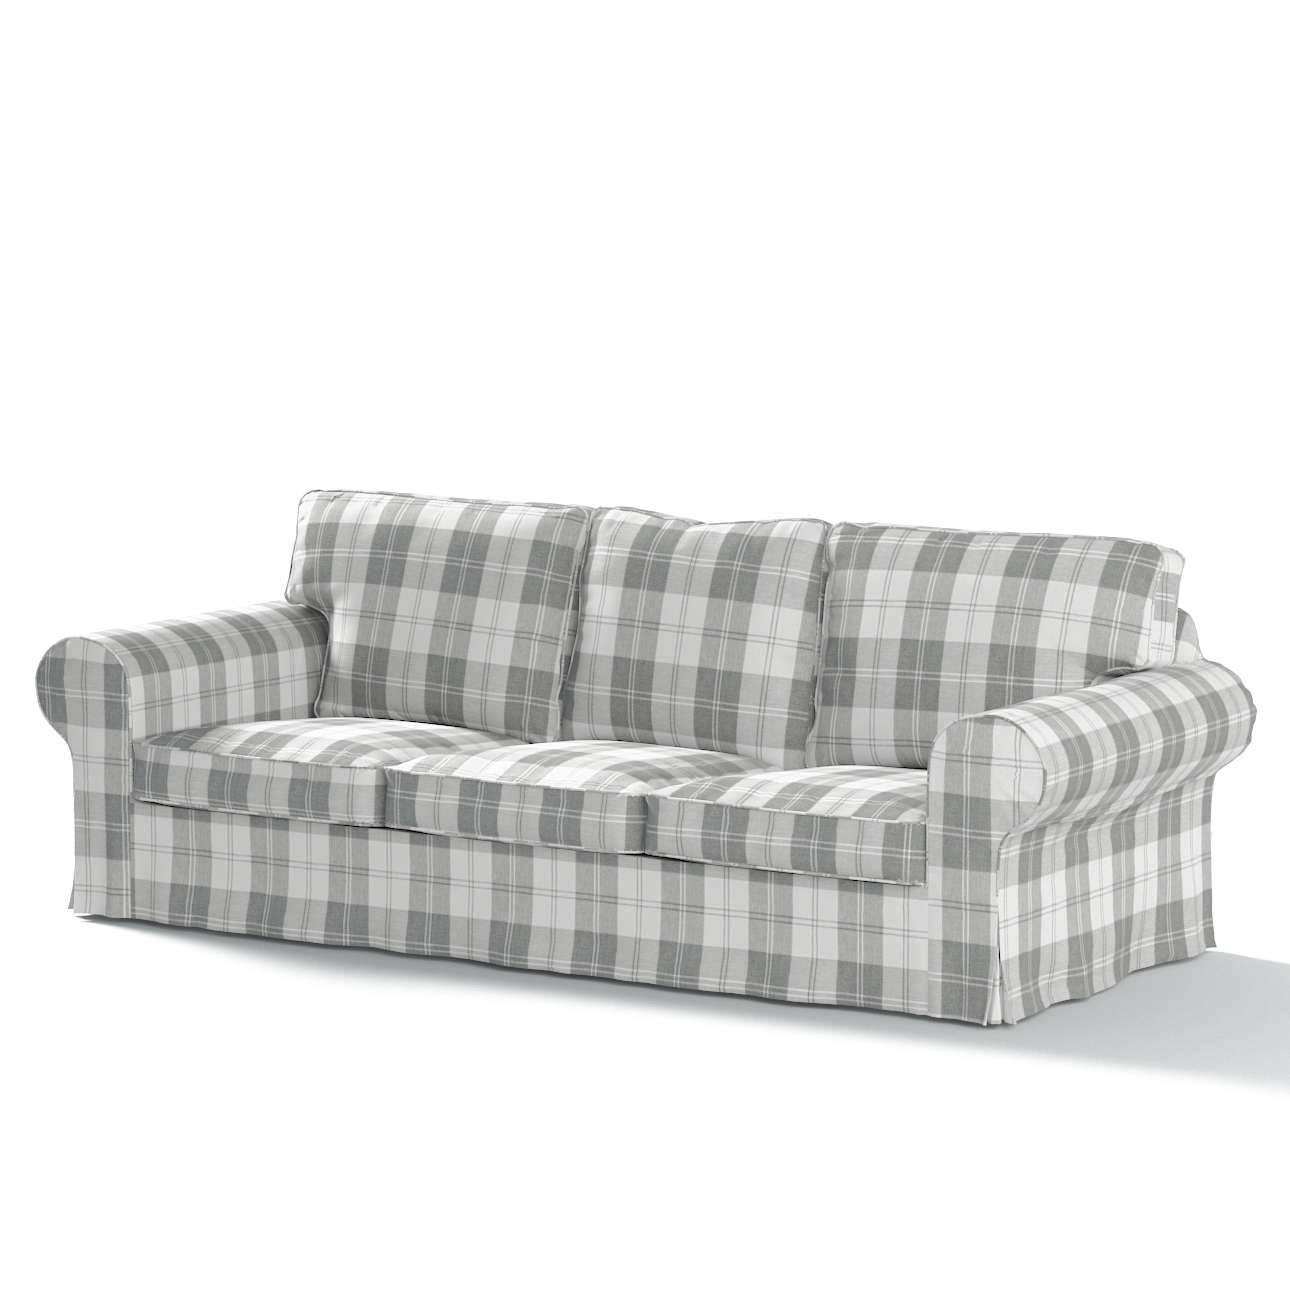 Excellent Ektorp 3 Seater Sofa Cover Download Free Architecture Designs Rallybritishbridgeorg